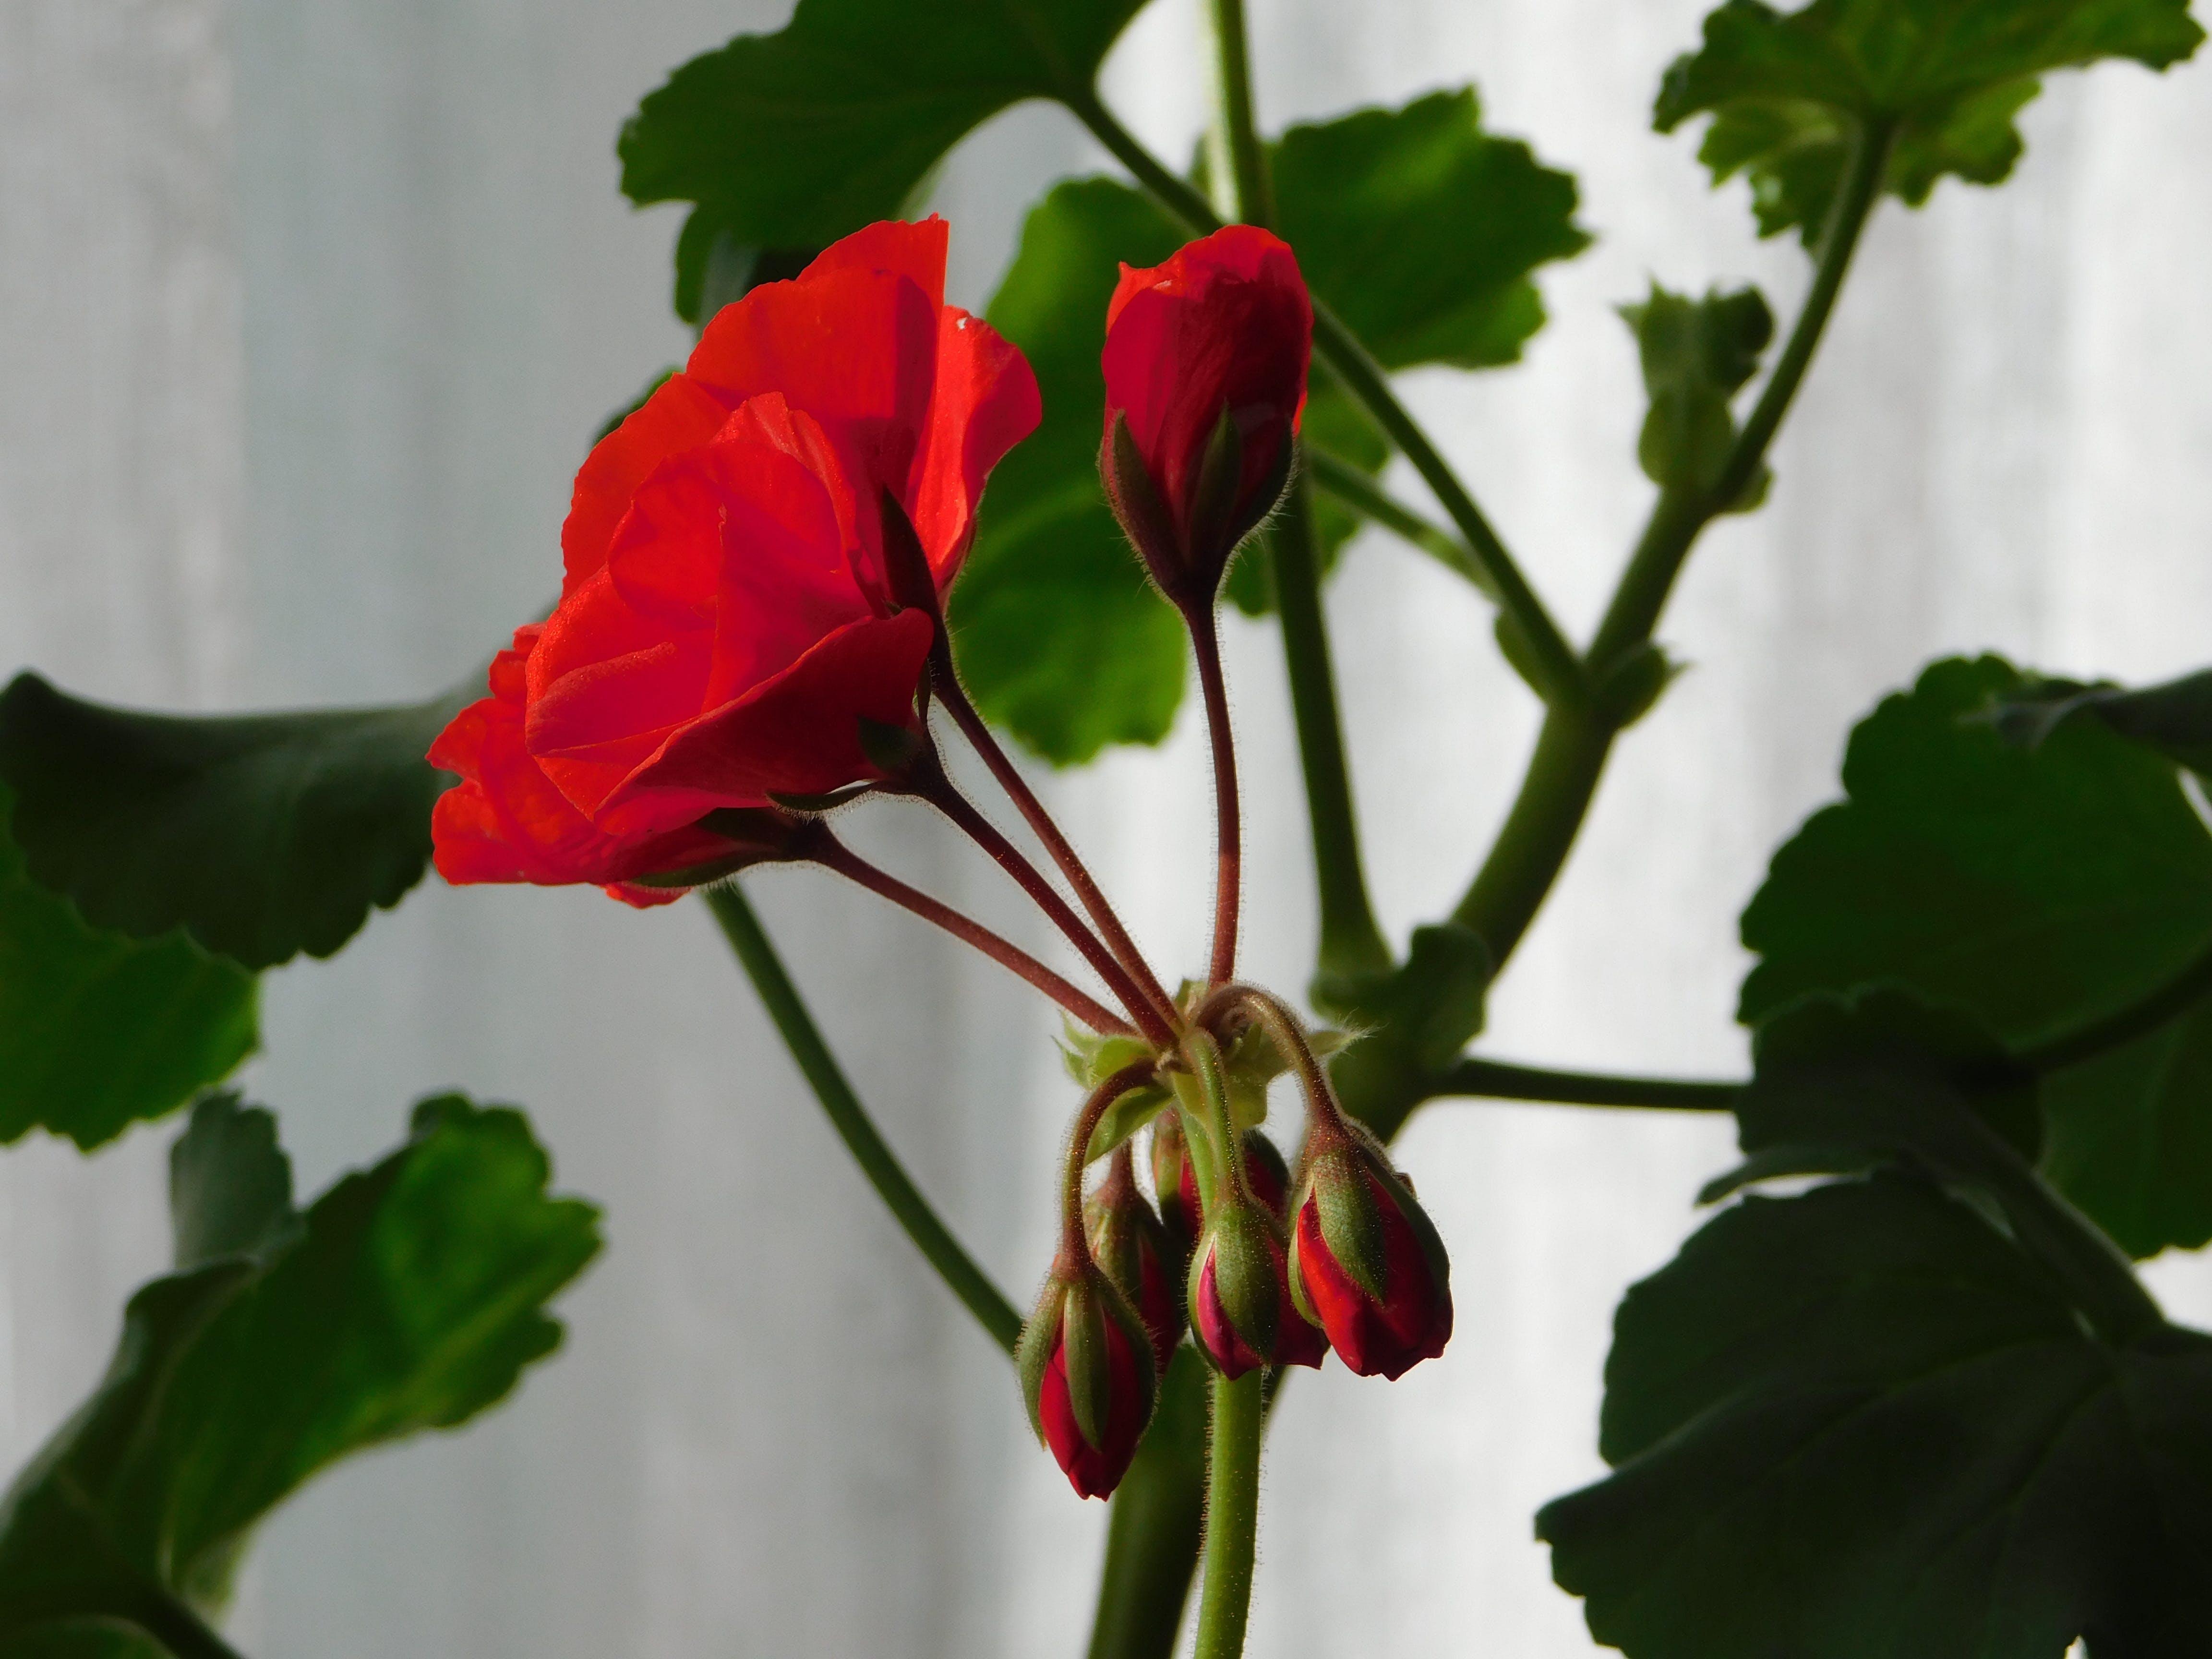 Free stock photo of Geranium Buds